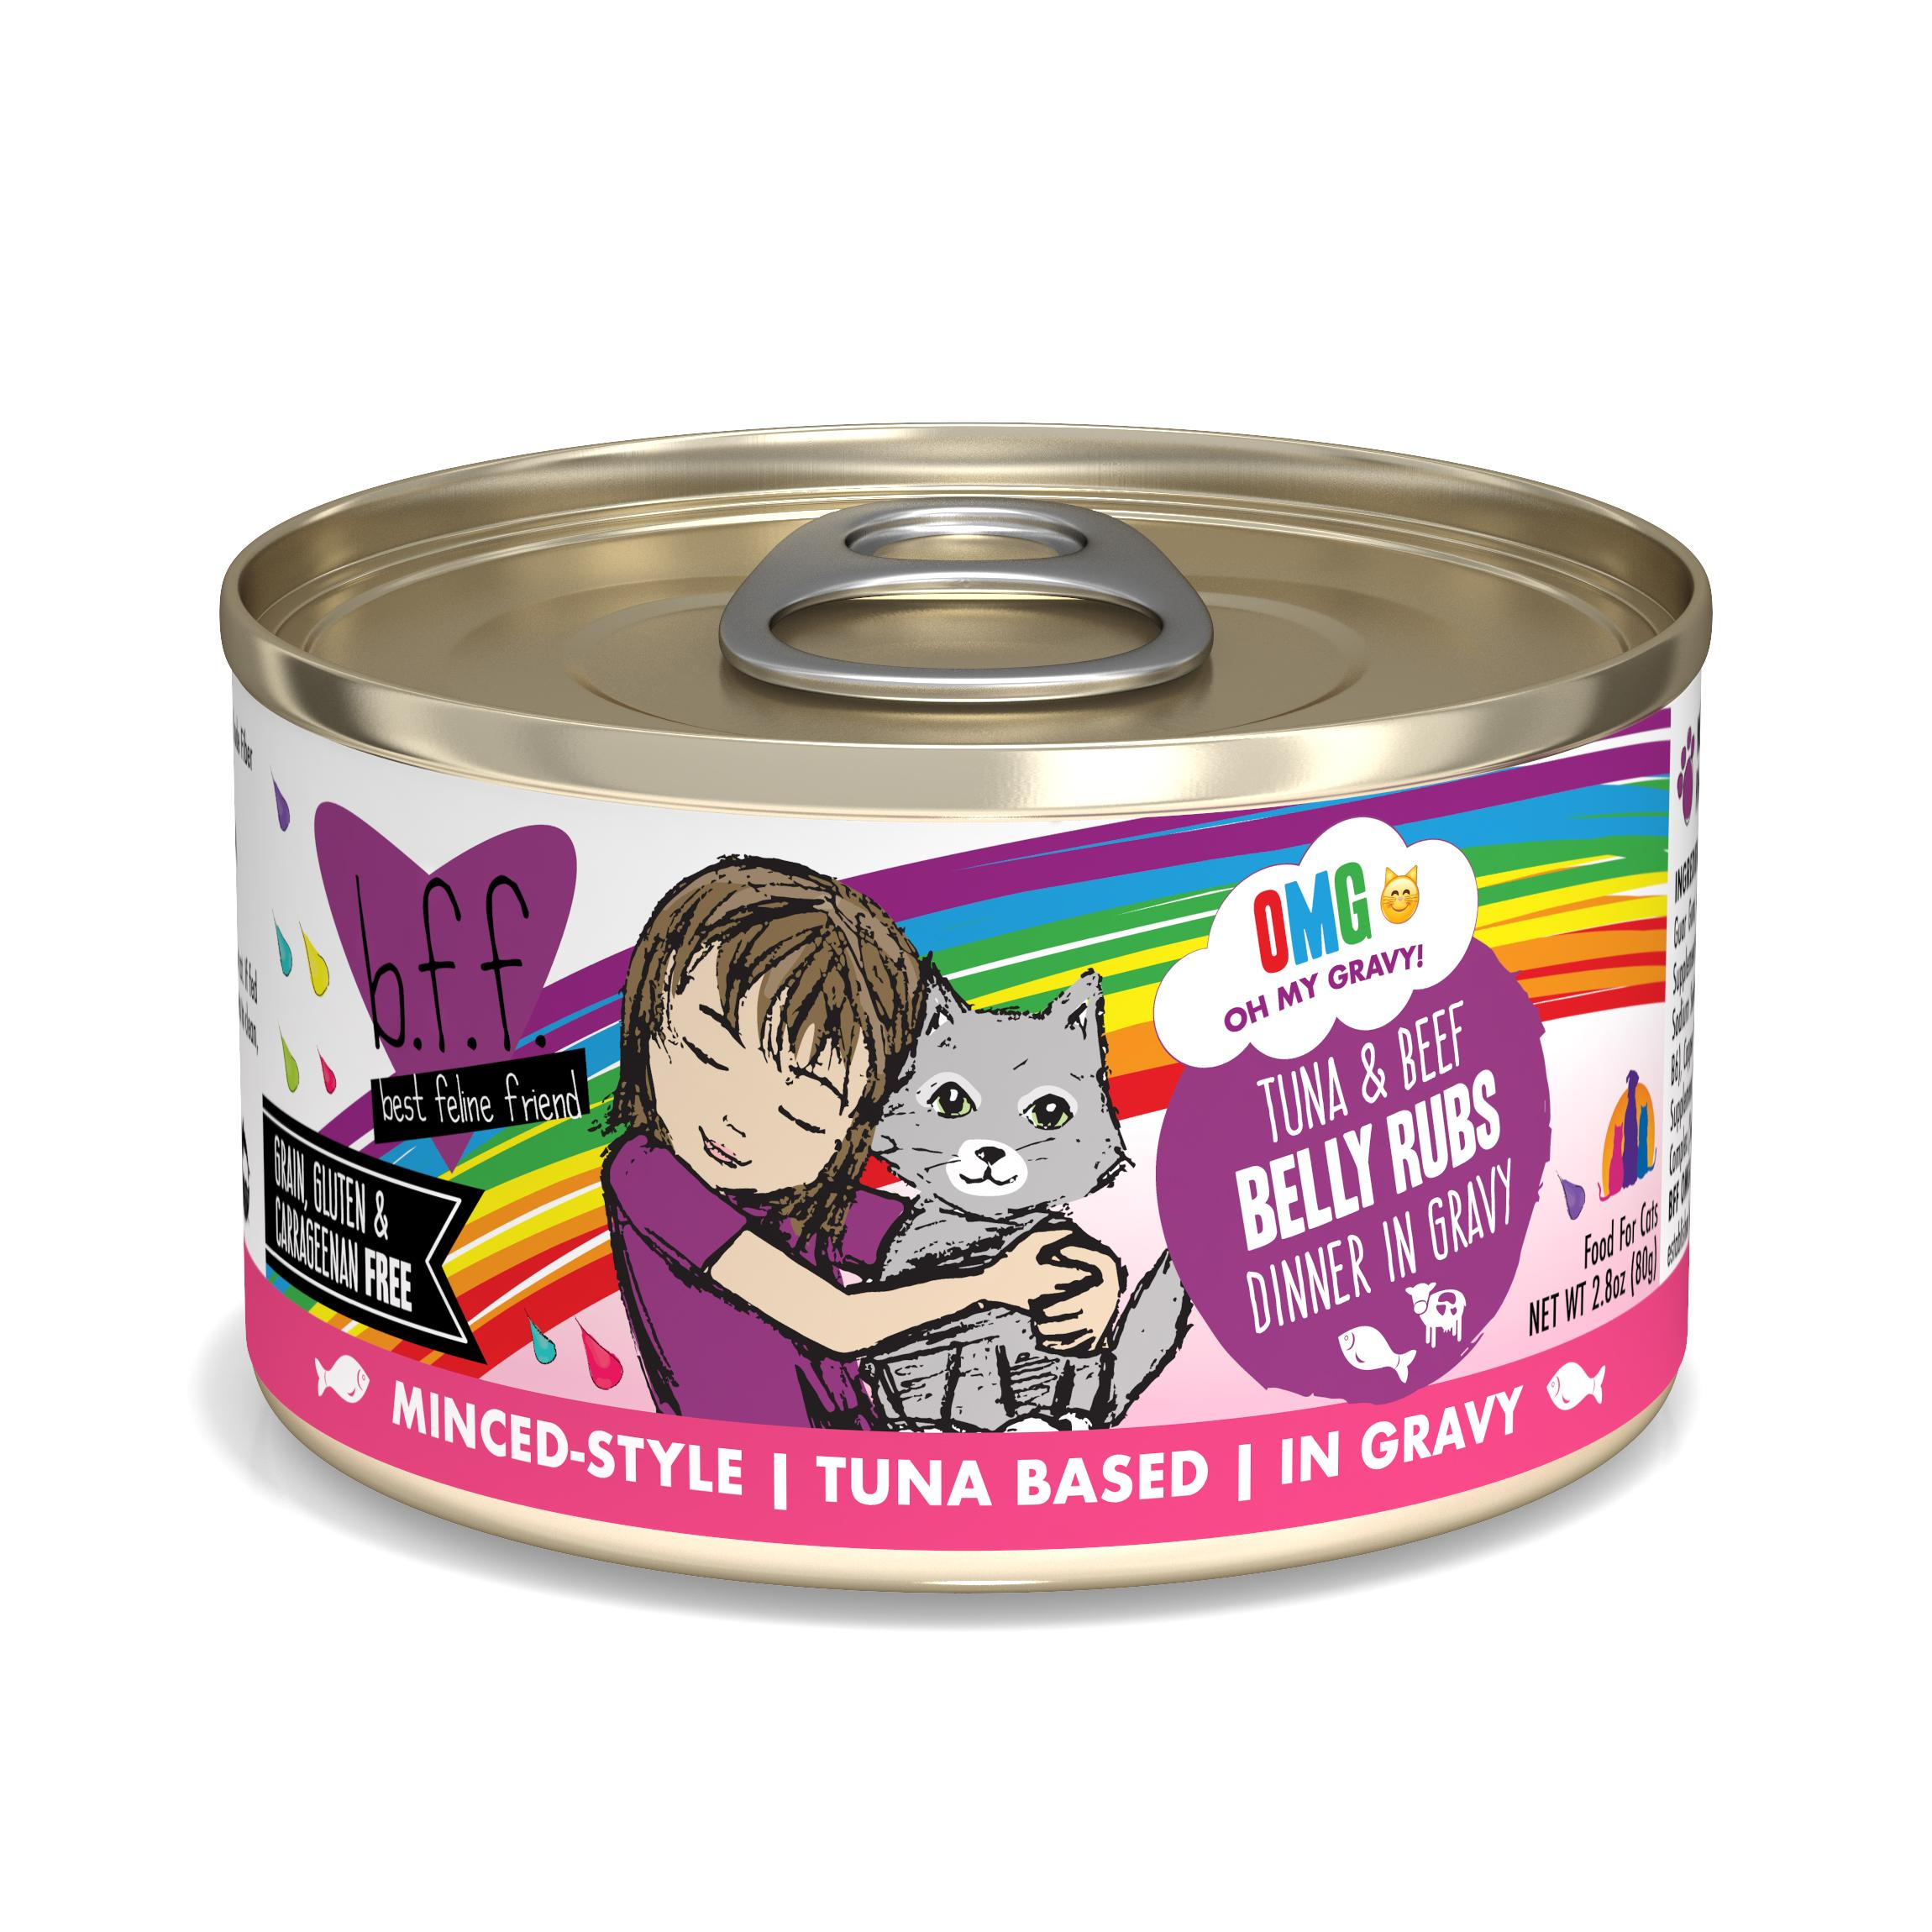 BFF Oh My Gravy! Belly Rubs! Tuna & Beef Dinner in Gravy Grain-Free Wet Cat Food, 2.8-oz